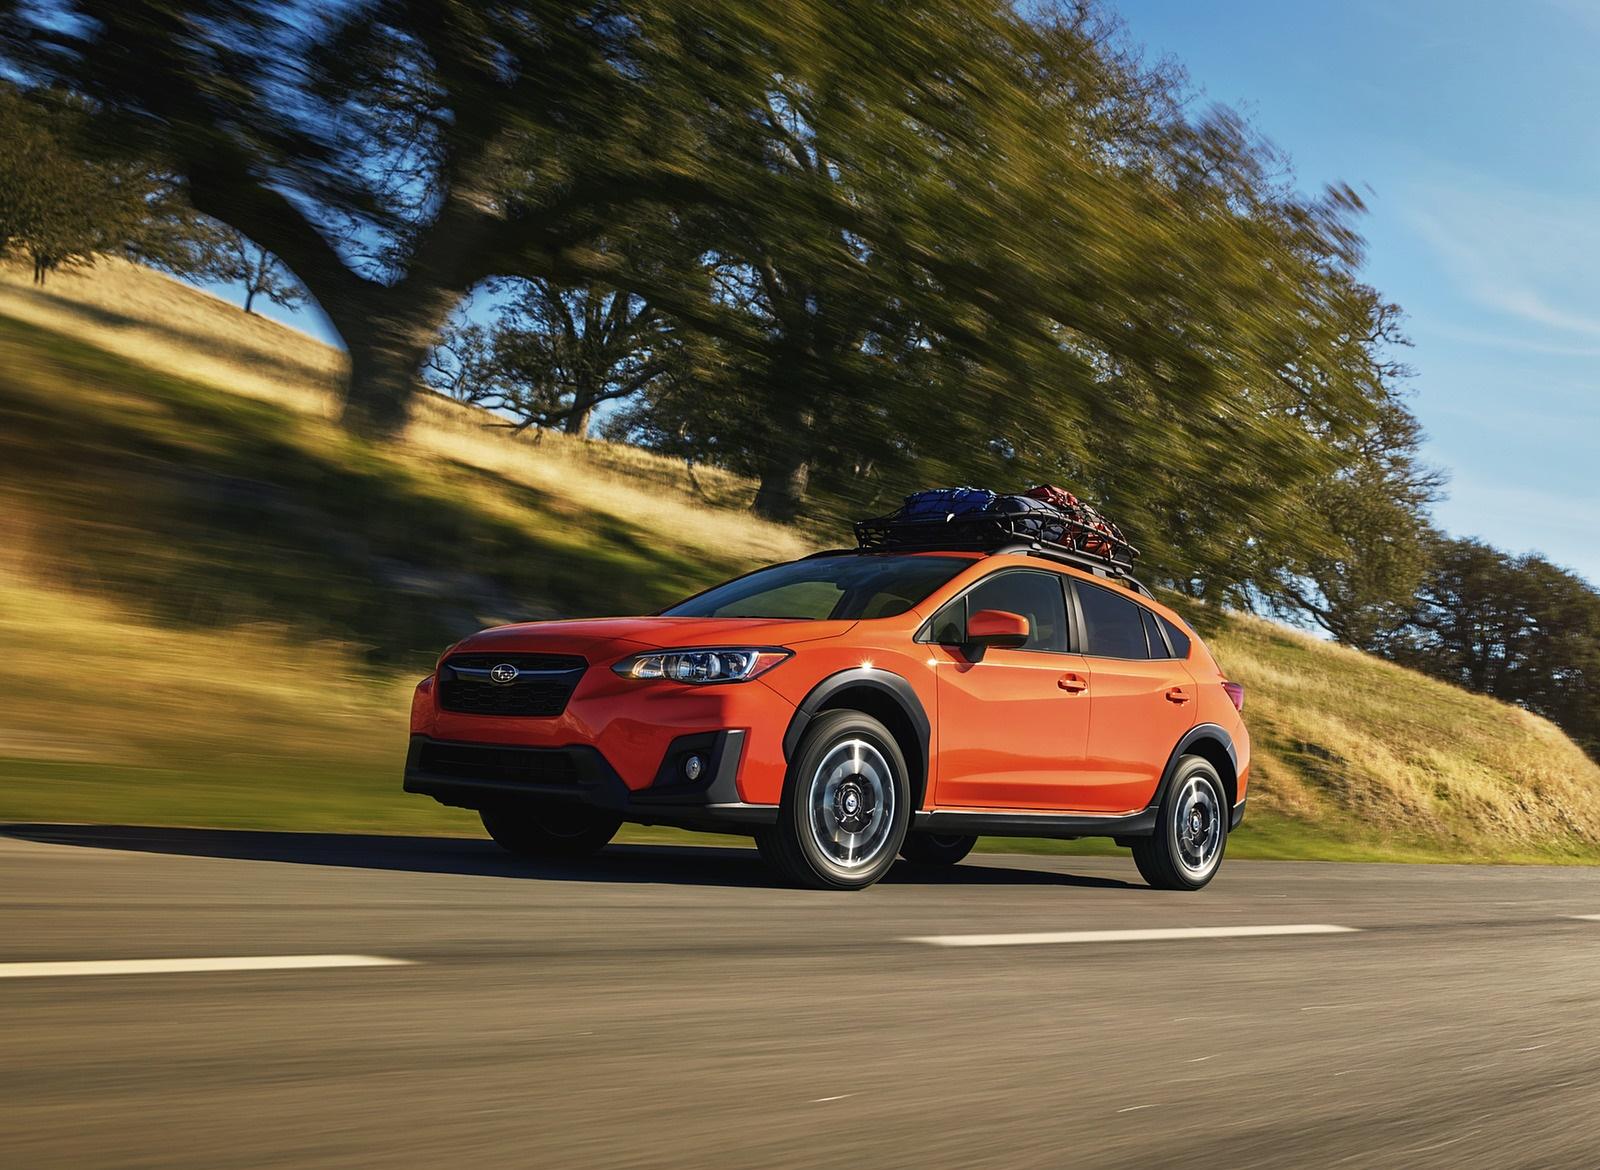 2018 Subaru Crosstrek Front Three-Quarter Wallpapers (1)